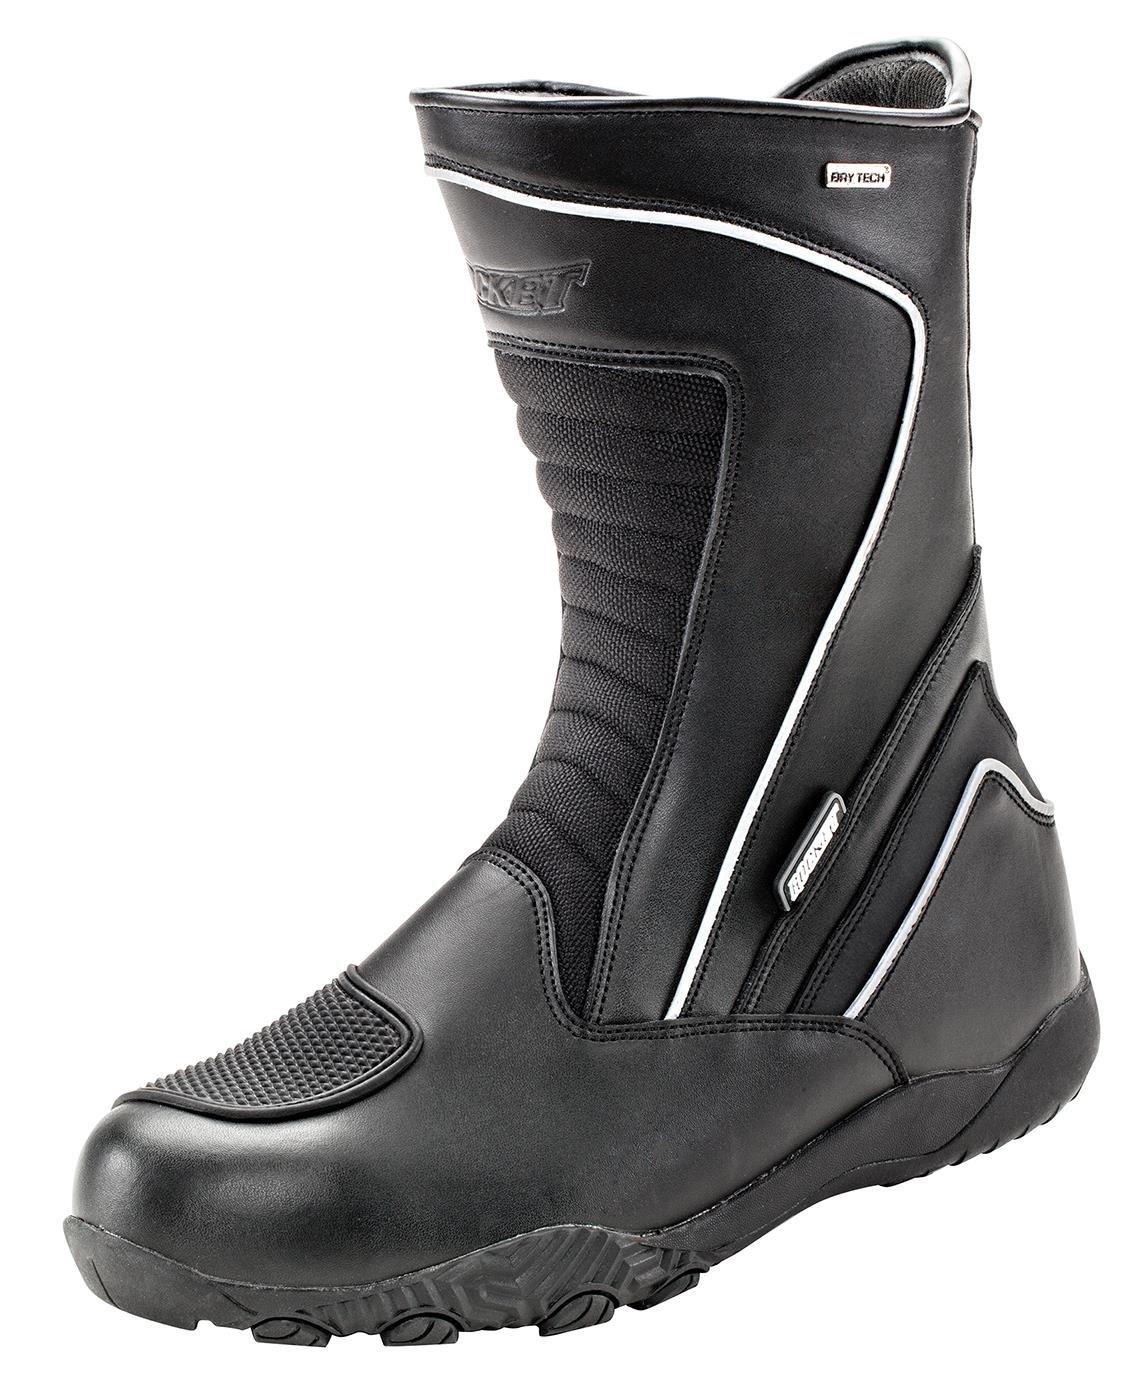 Joe Rocket Meteor FX Boots 1515-0011 1515-0011